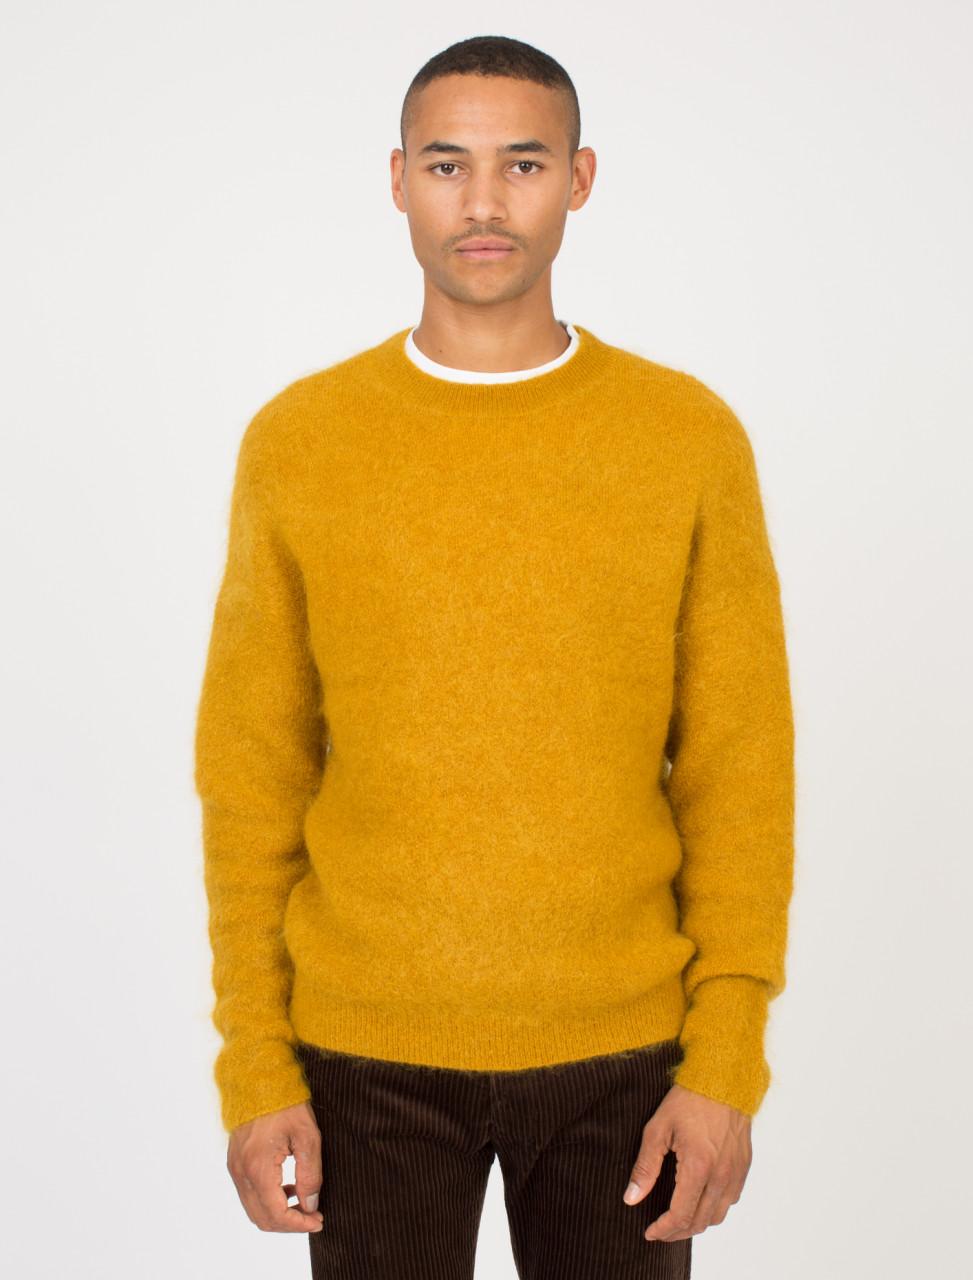 Nosti Sweater